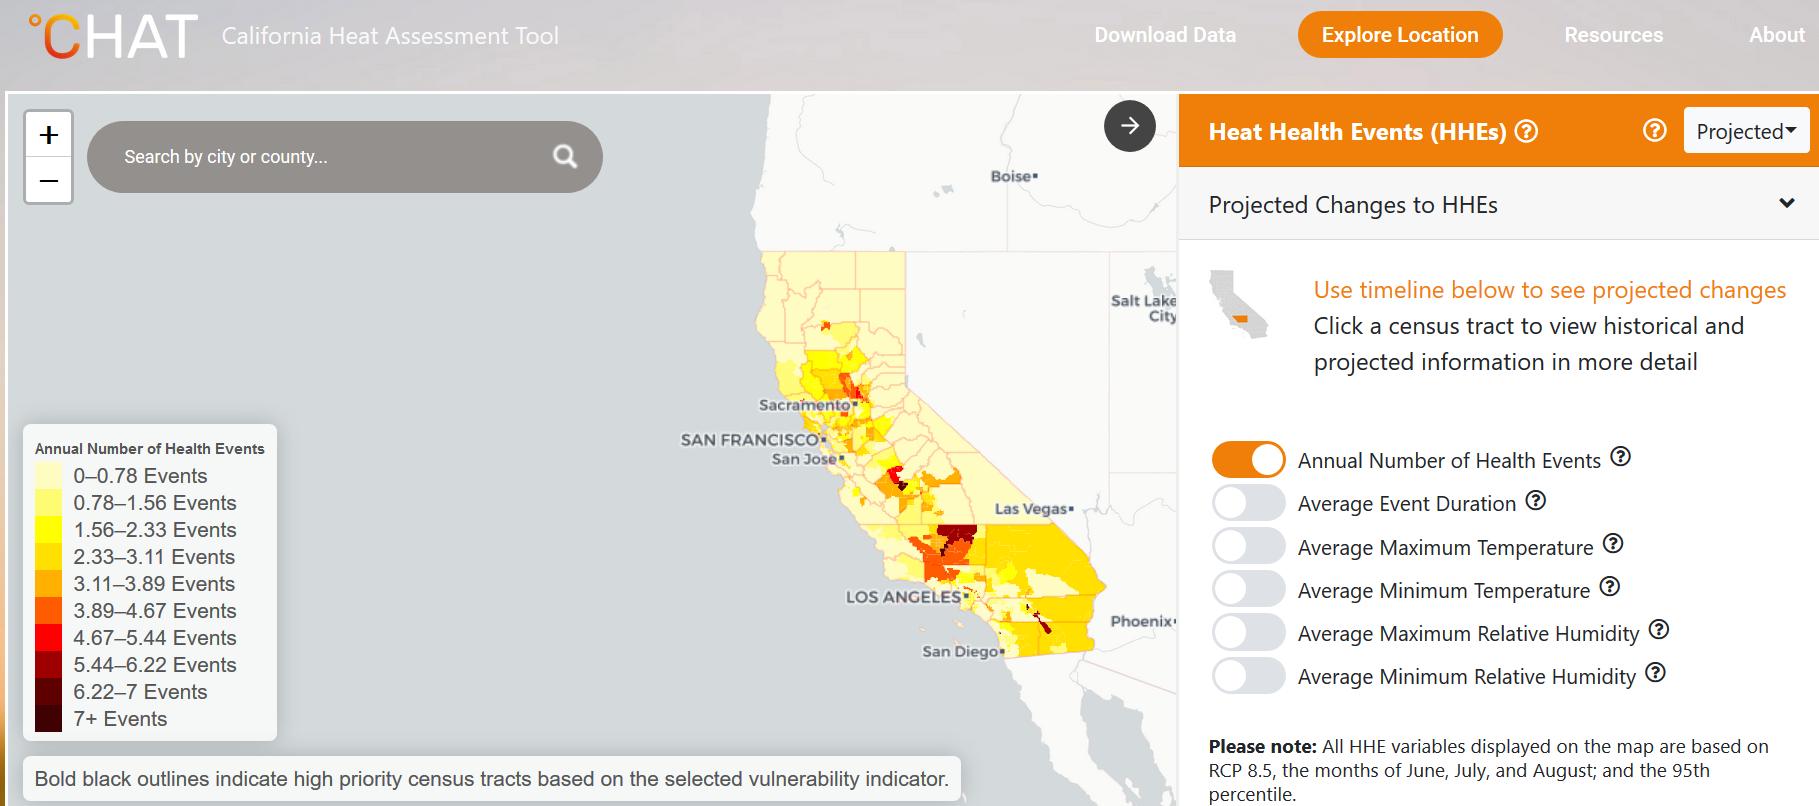 California Heat Assessment Tool